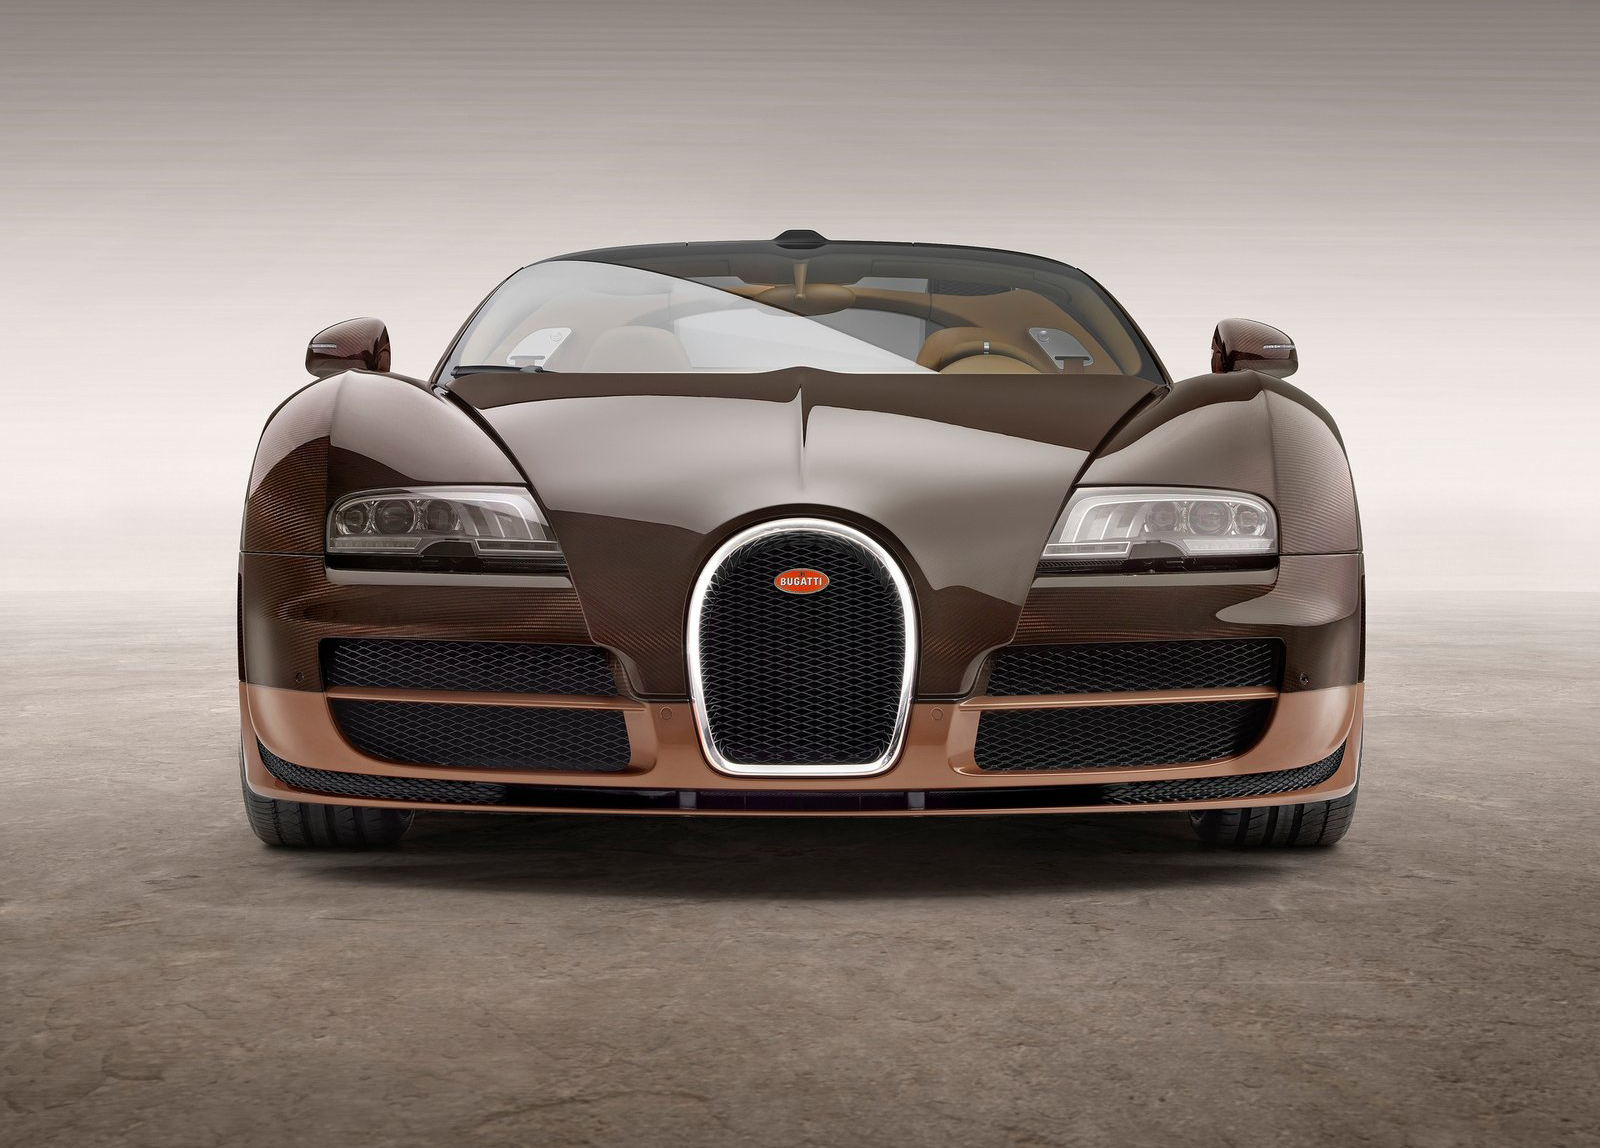 2014 Bugatti Veyron Grand Sport Vitesse Rembrandt News And Information